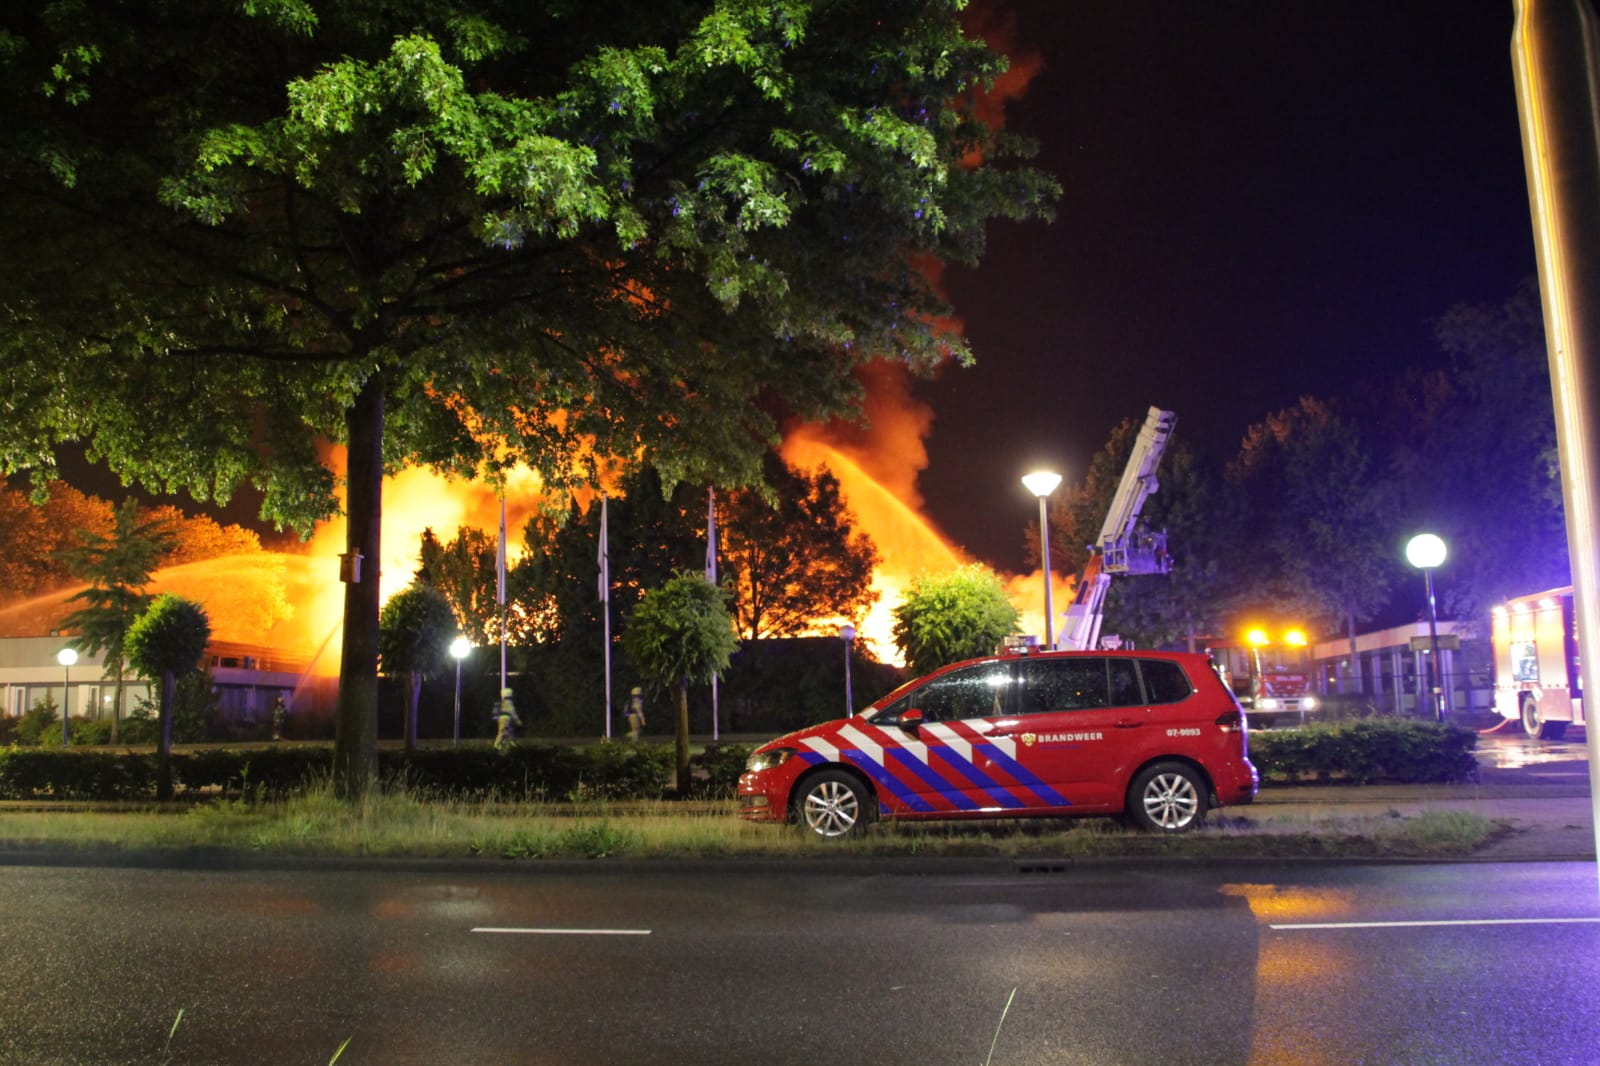 Zeer grote brand verwoest ROVC aan de Galvanistraat in Ede (video)